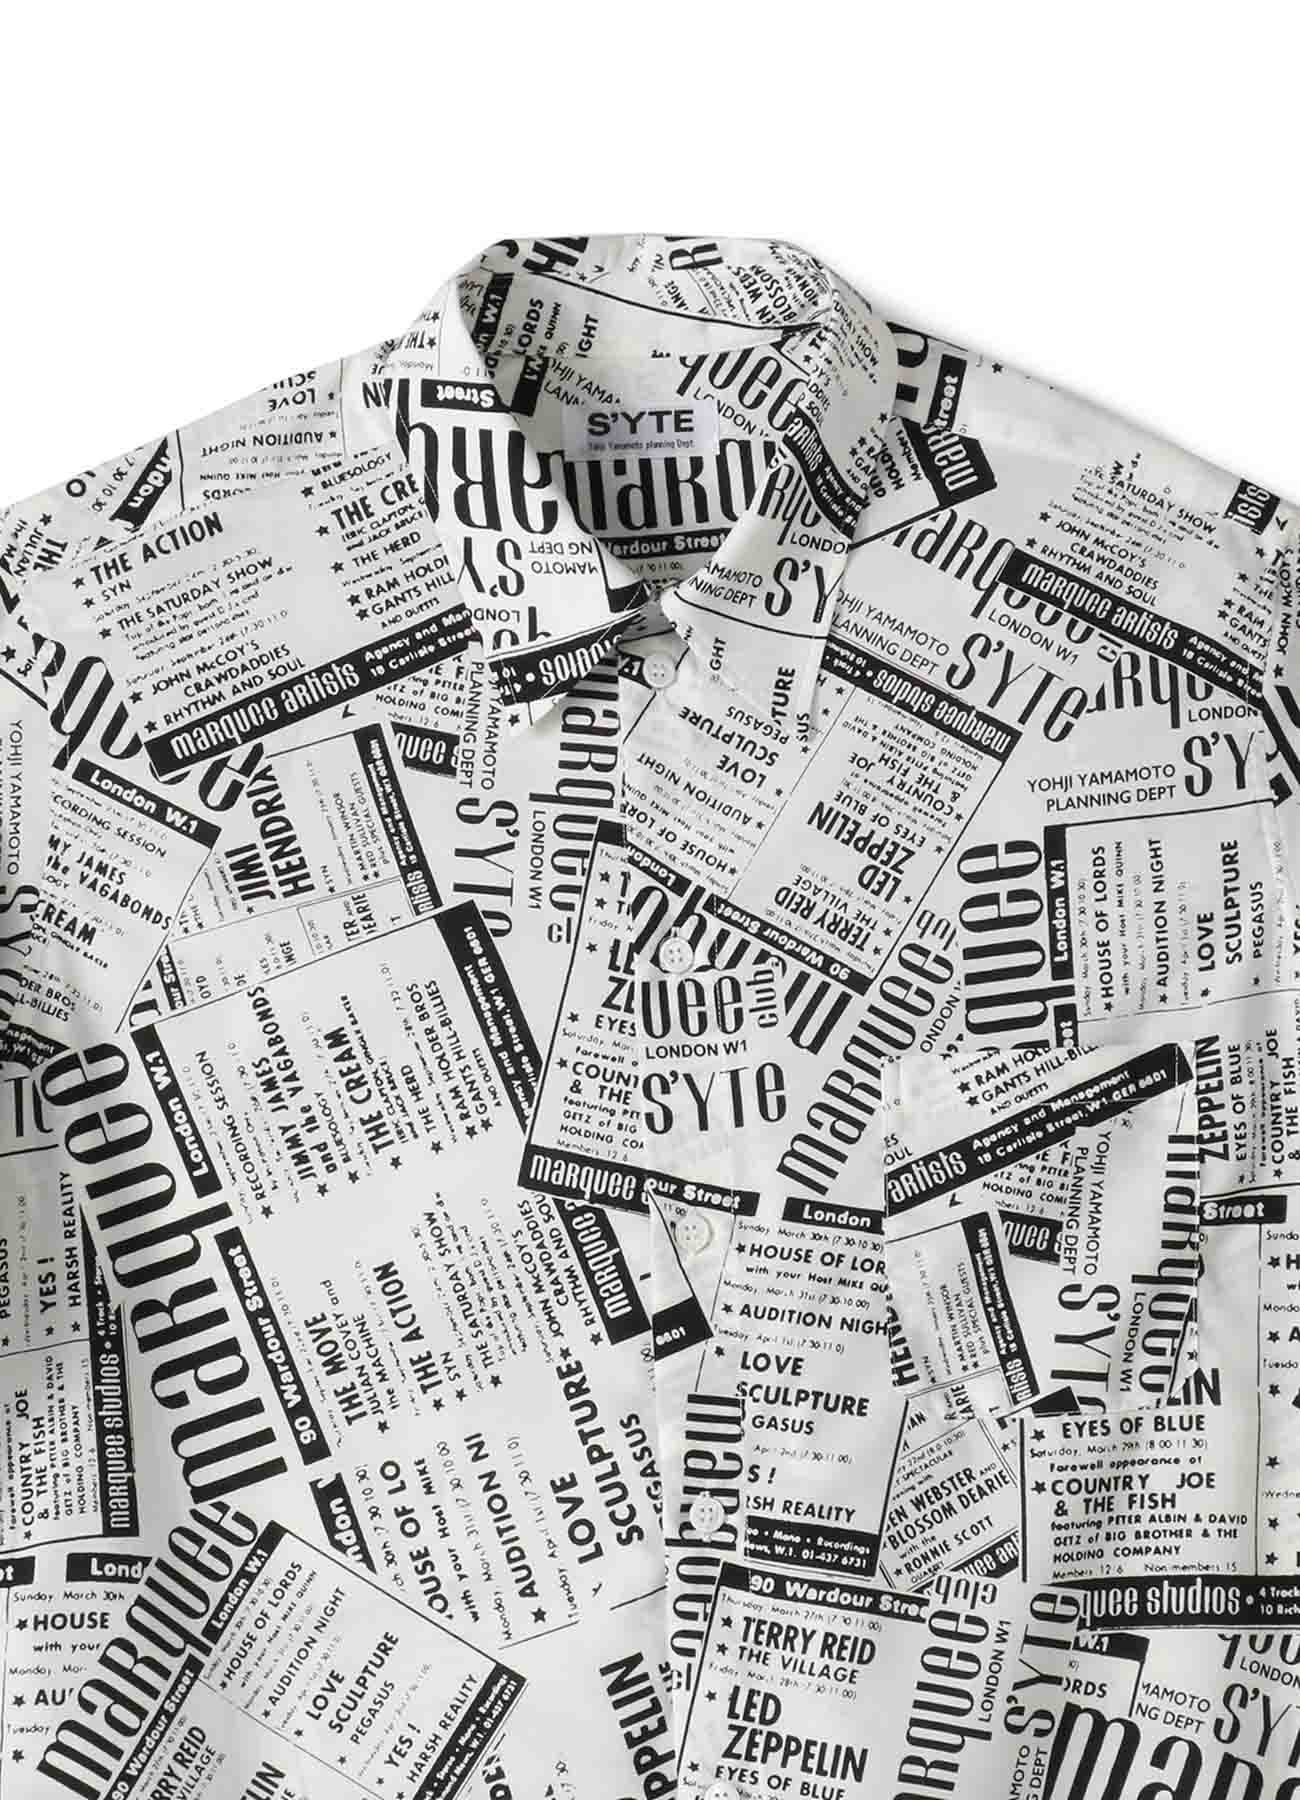 S'YTE × marquee club(R) Polyester Span Loan Newspaper Regular Shirt